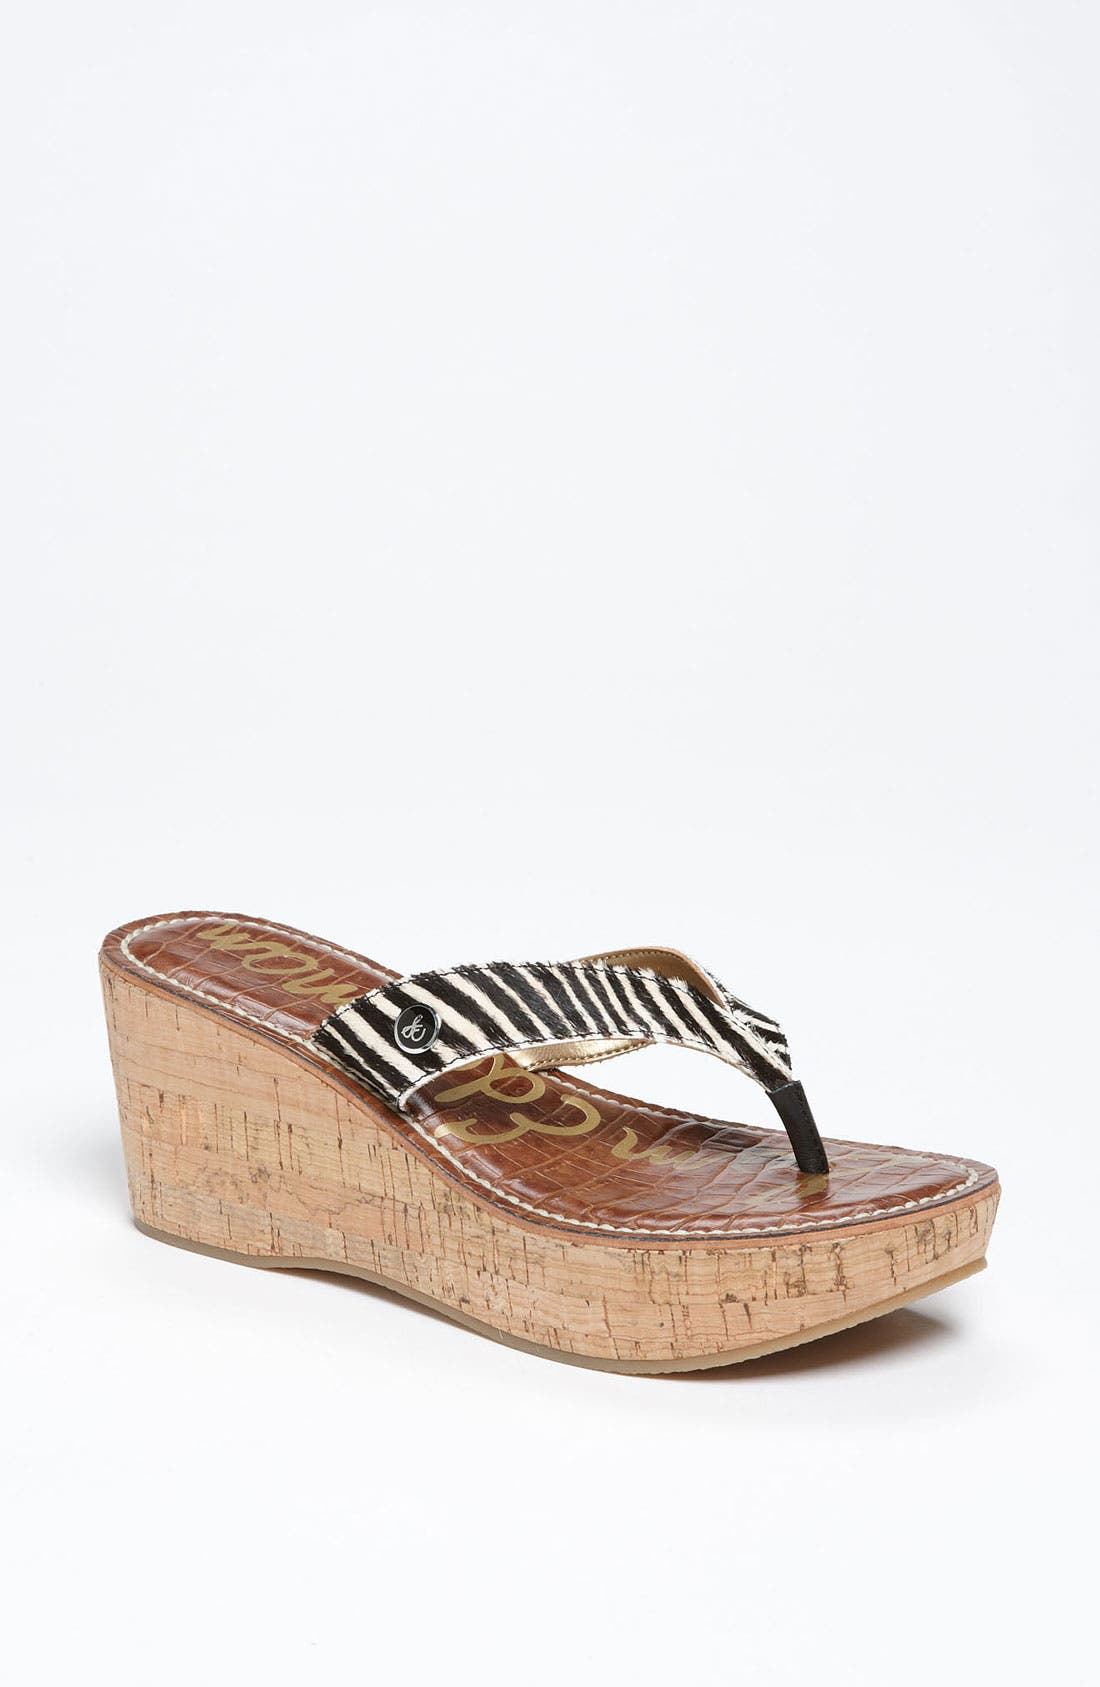 Main Image - Sam Edelman 'Romy' Wedge Sandal